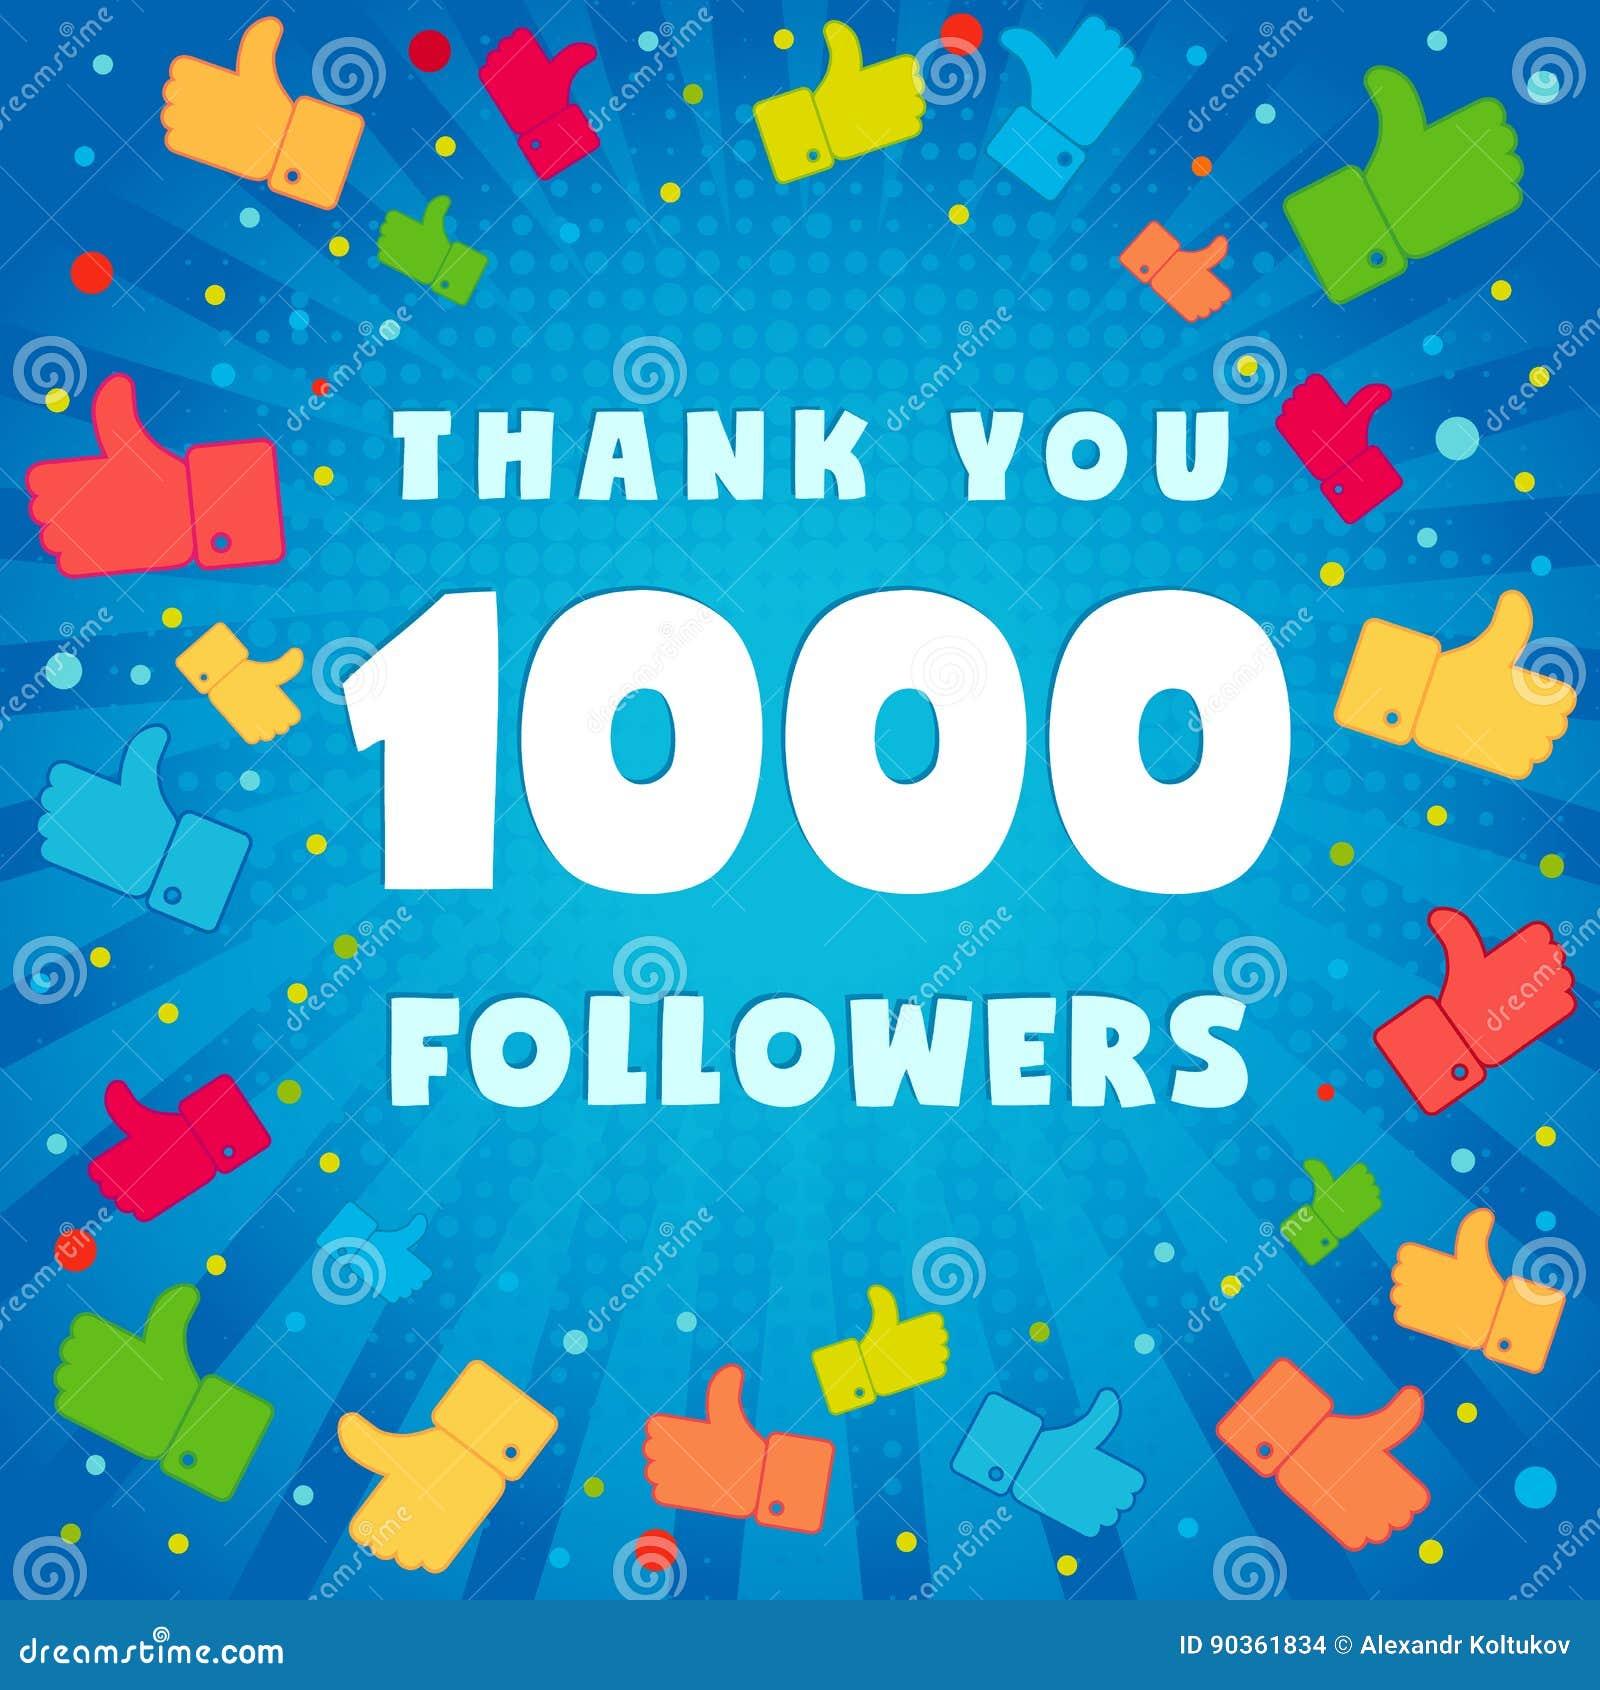 1k thank you followers